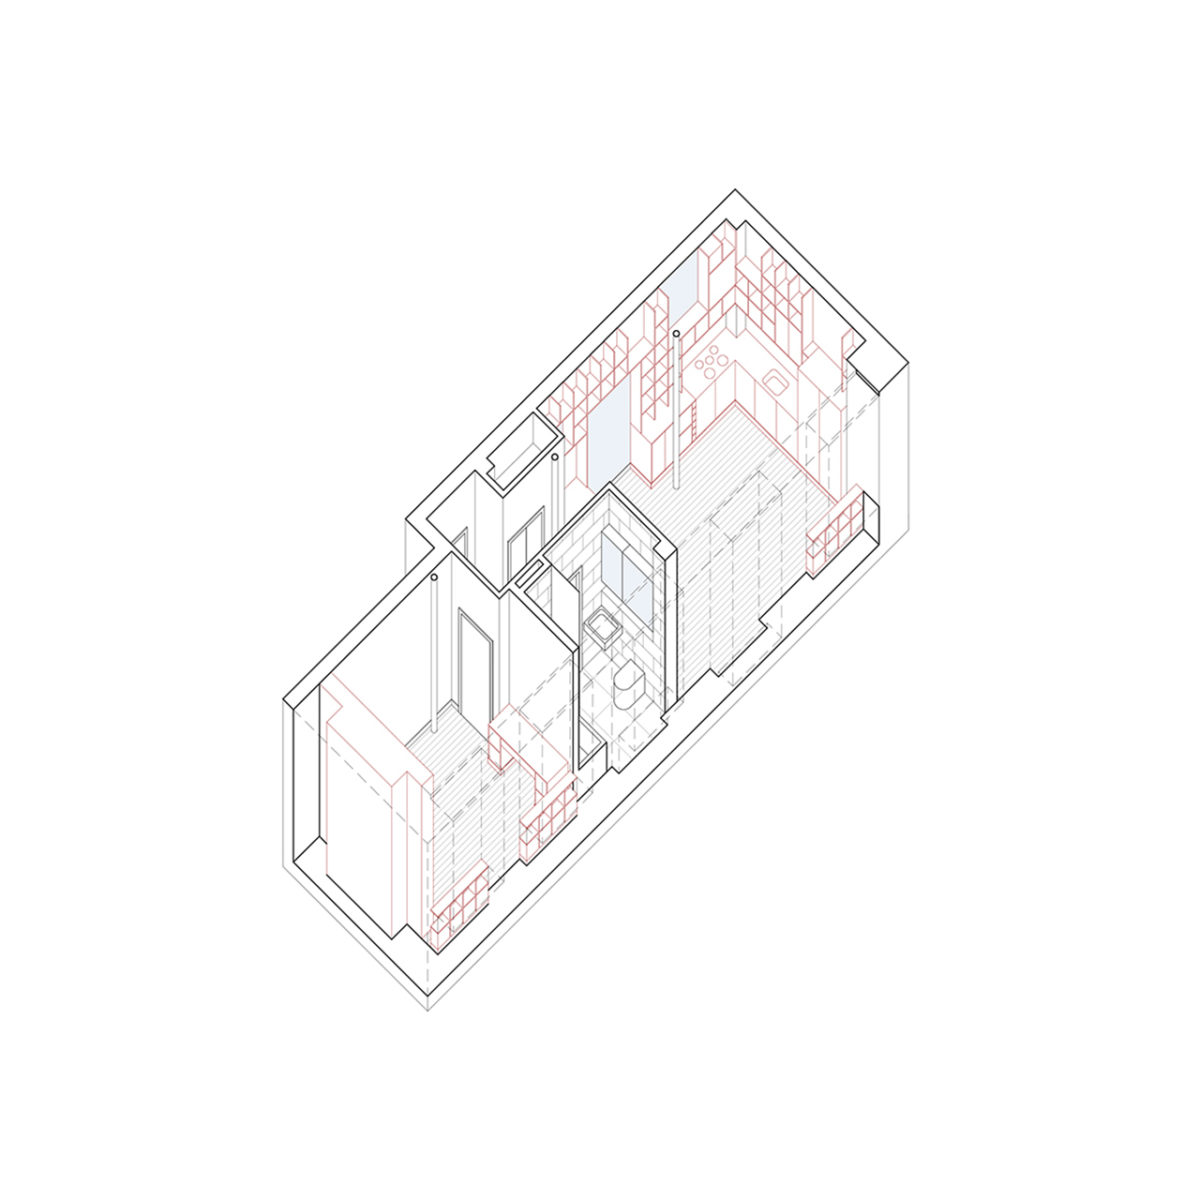 Practica Estudio De Arquitectura Urbanismo Y Diseno